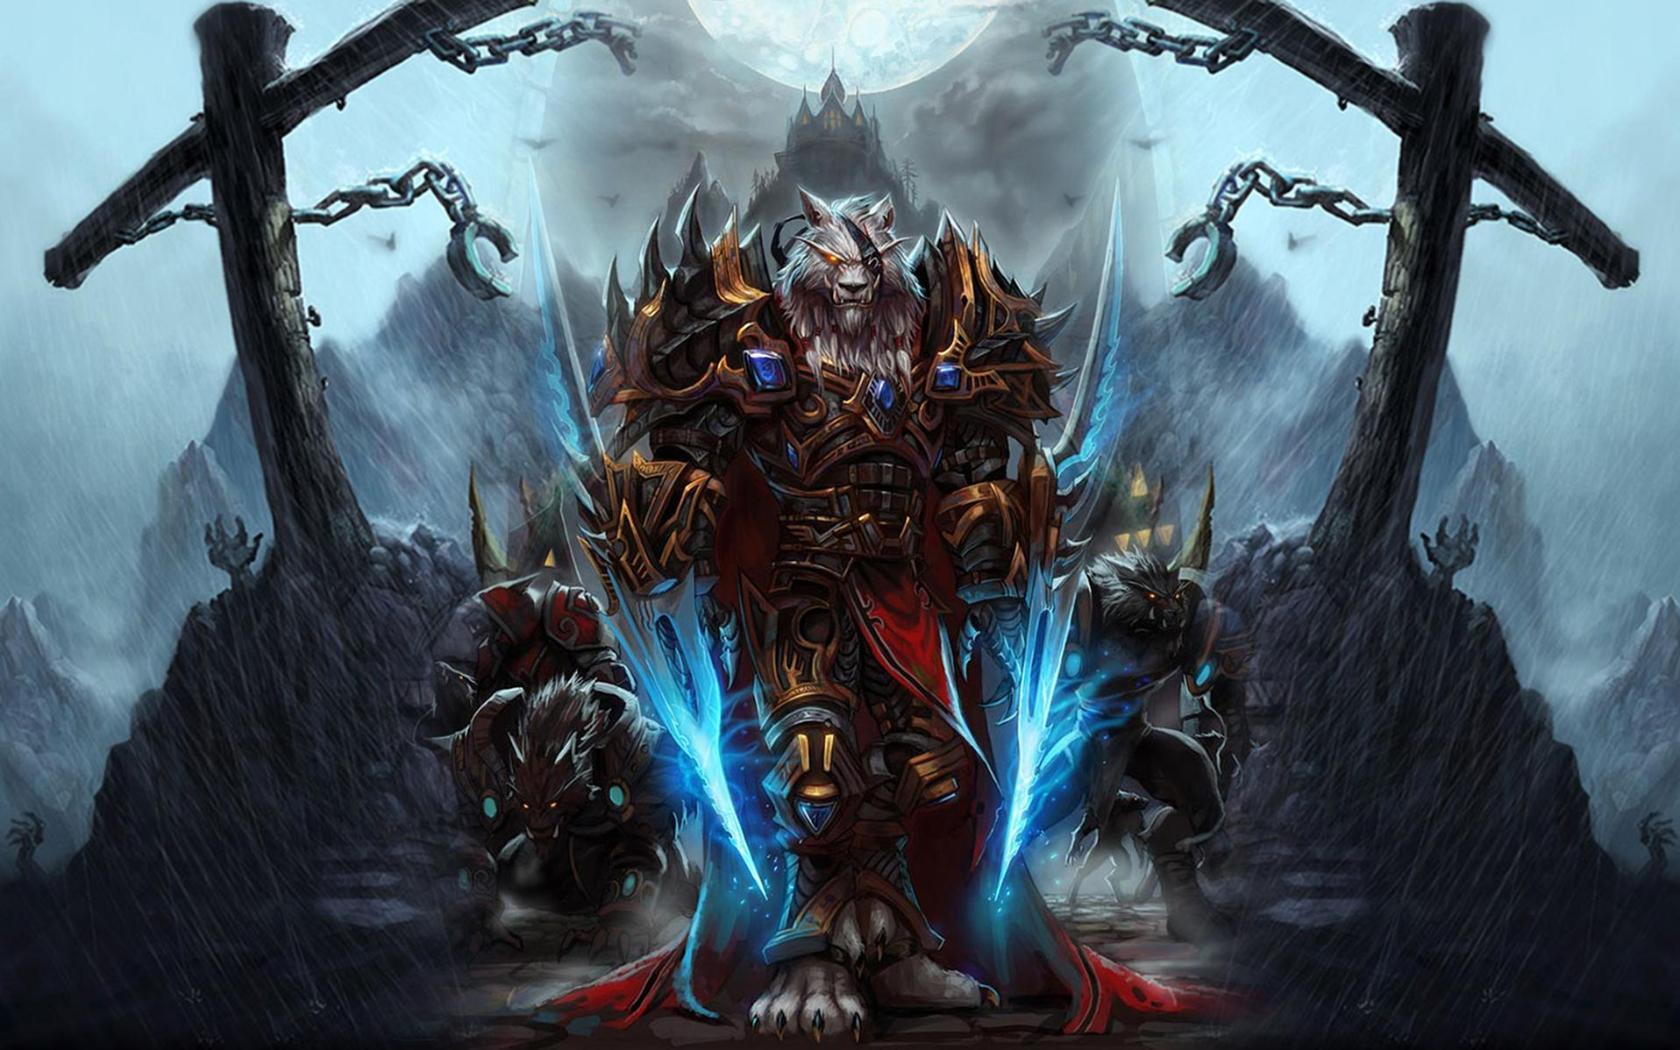 Monters Warcraft Wallpaper Games